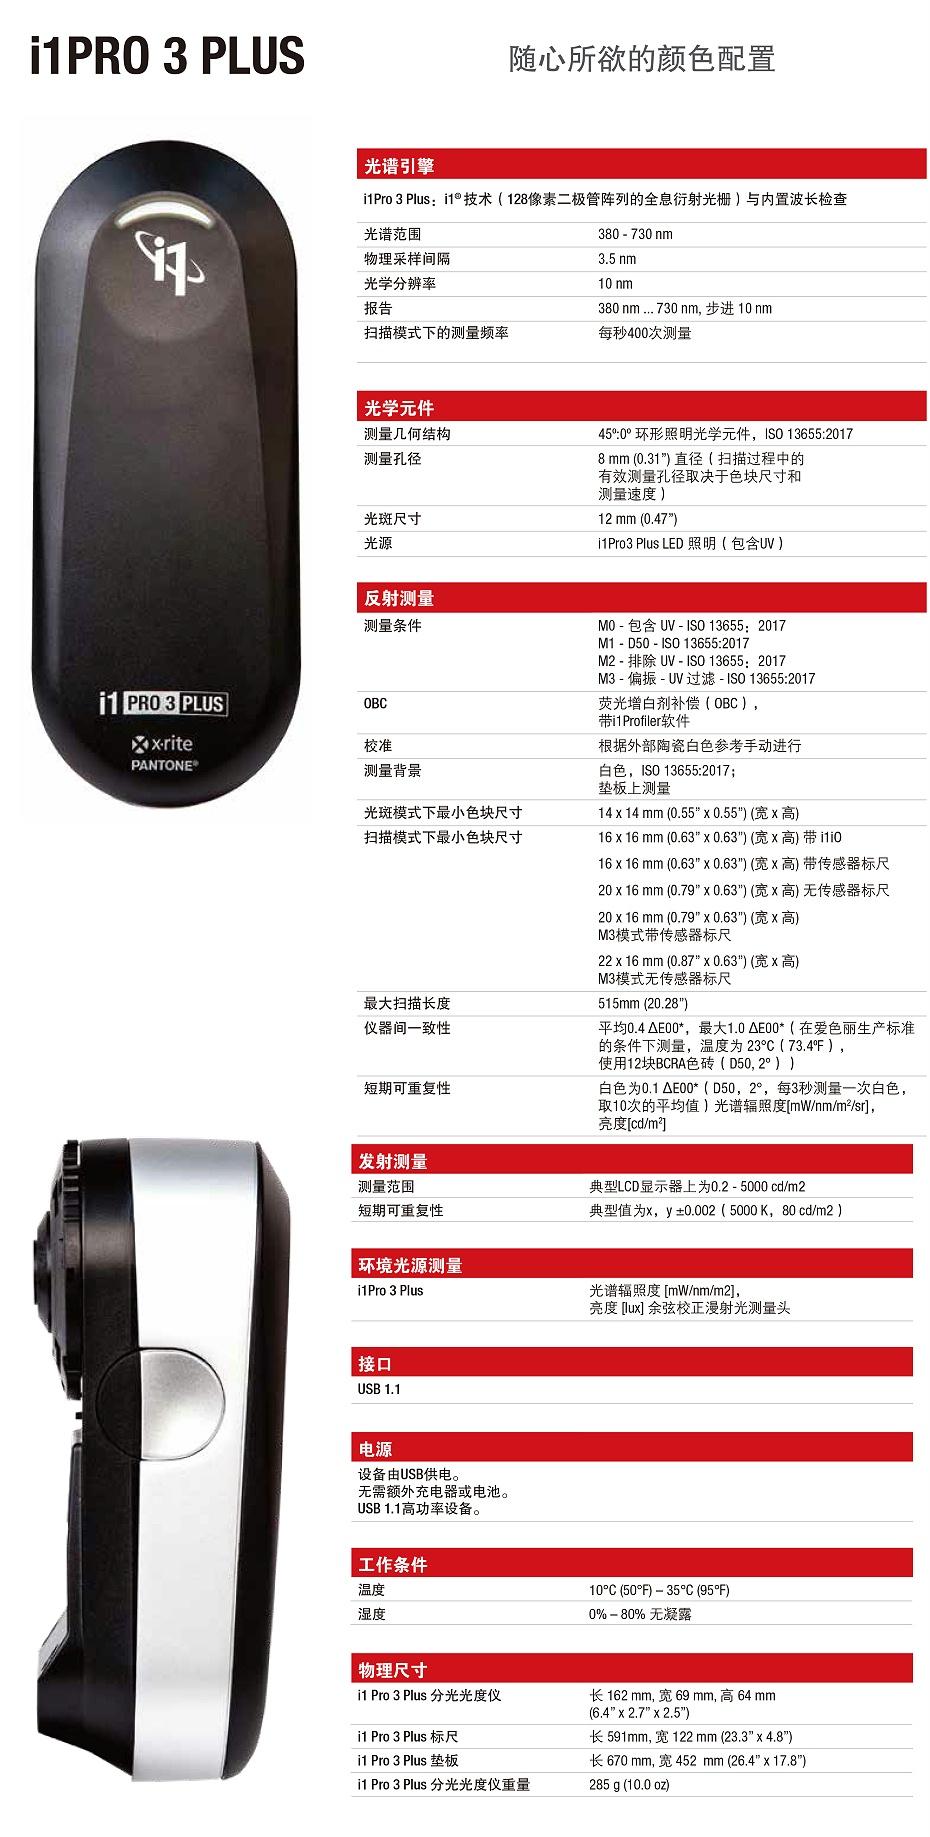 L7-701-i1pro-3-plus-spec-sheet_CH-1